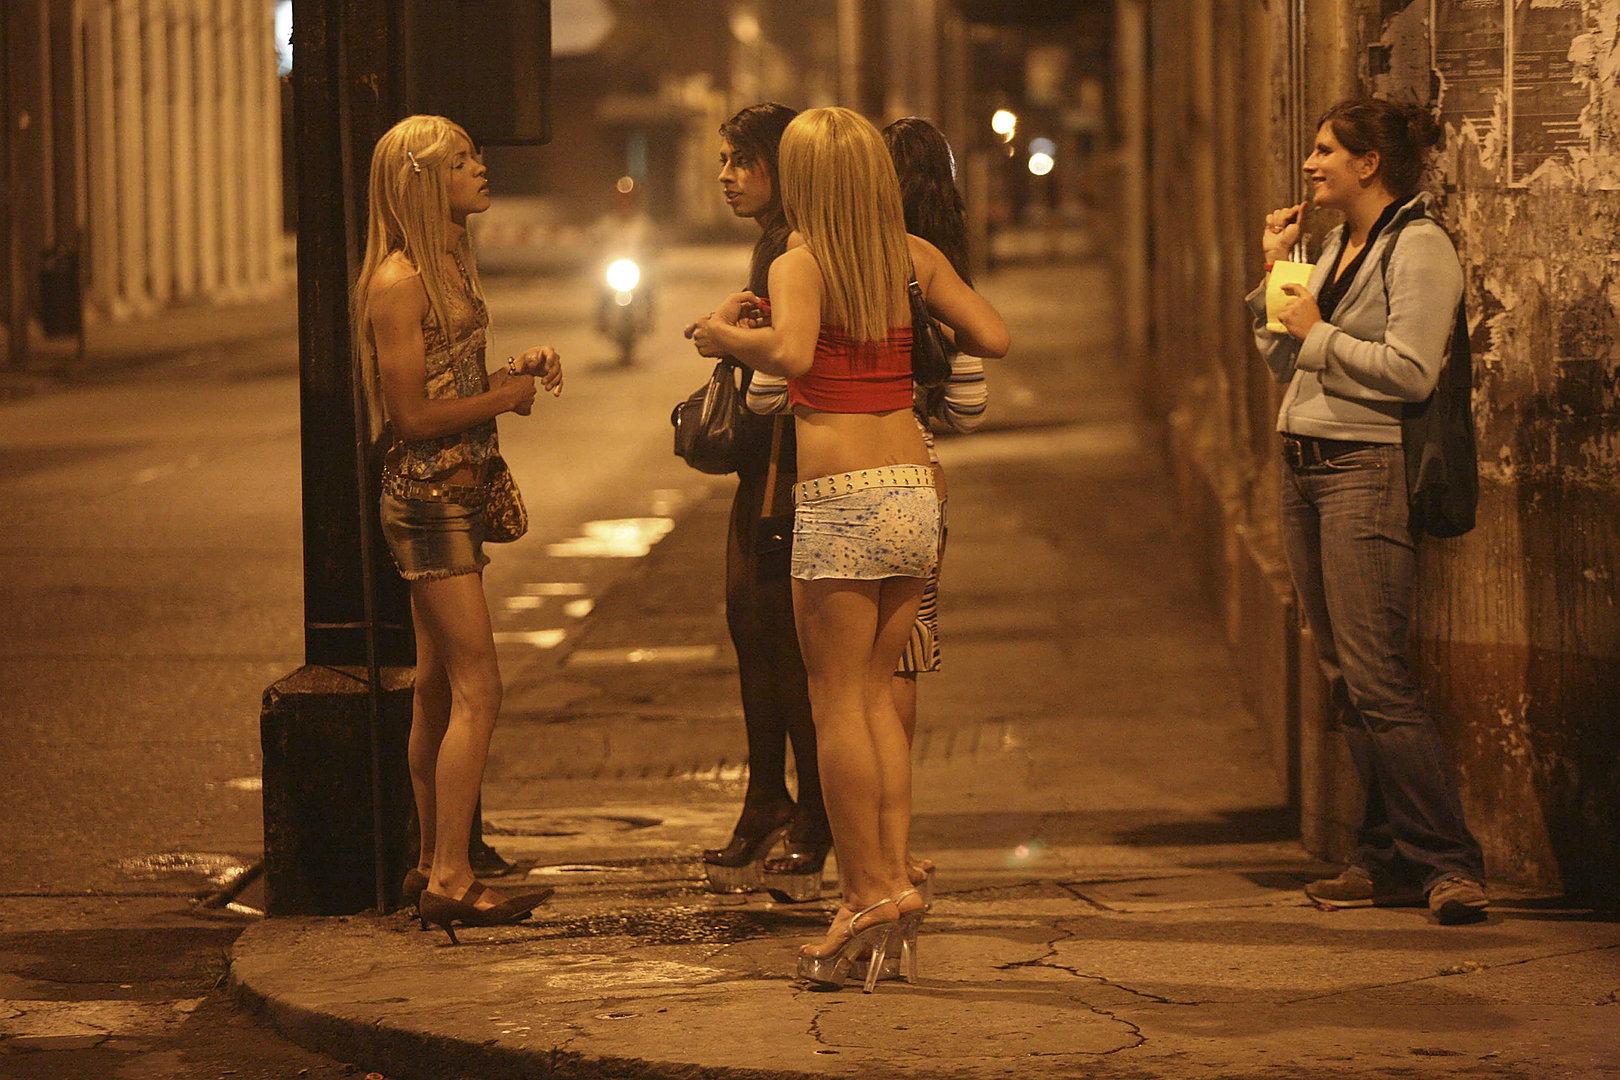 Kajlich online prostitution